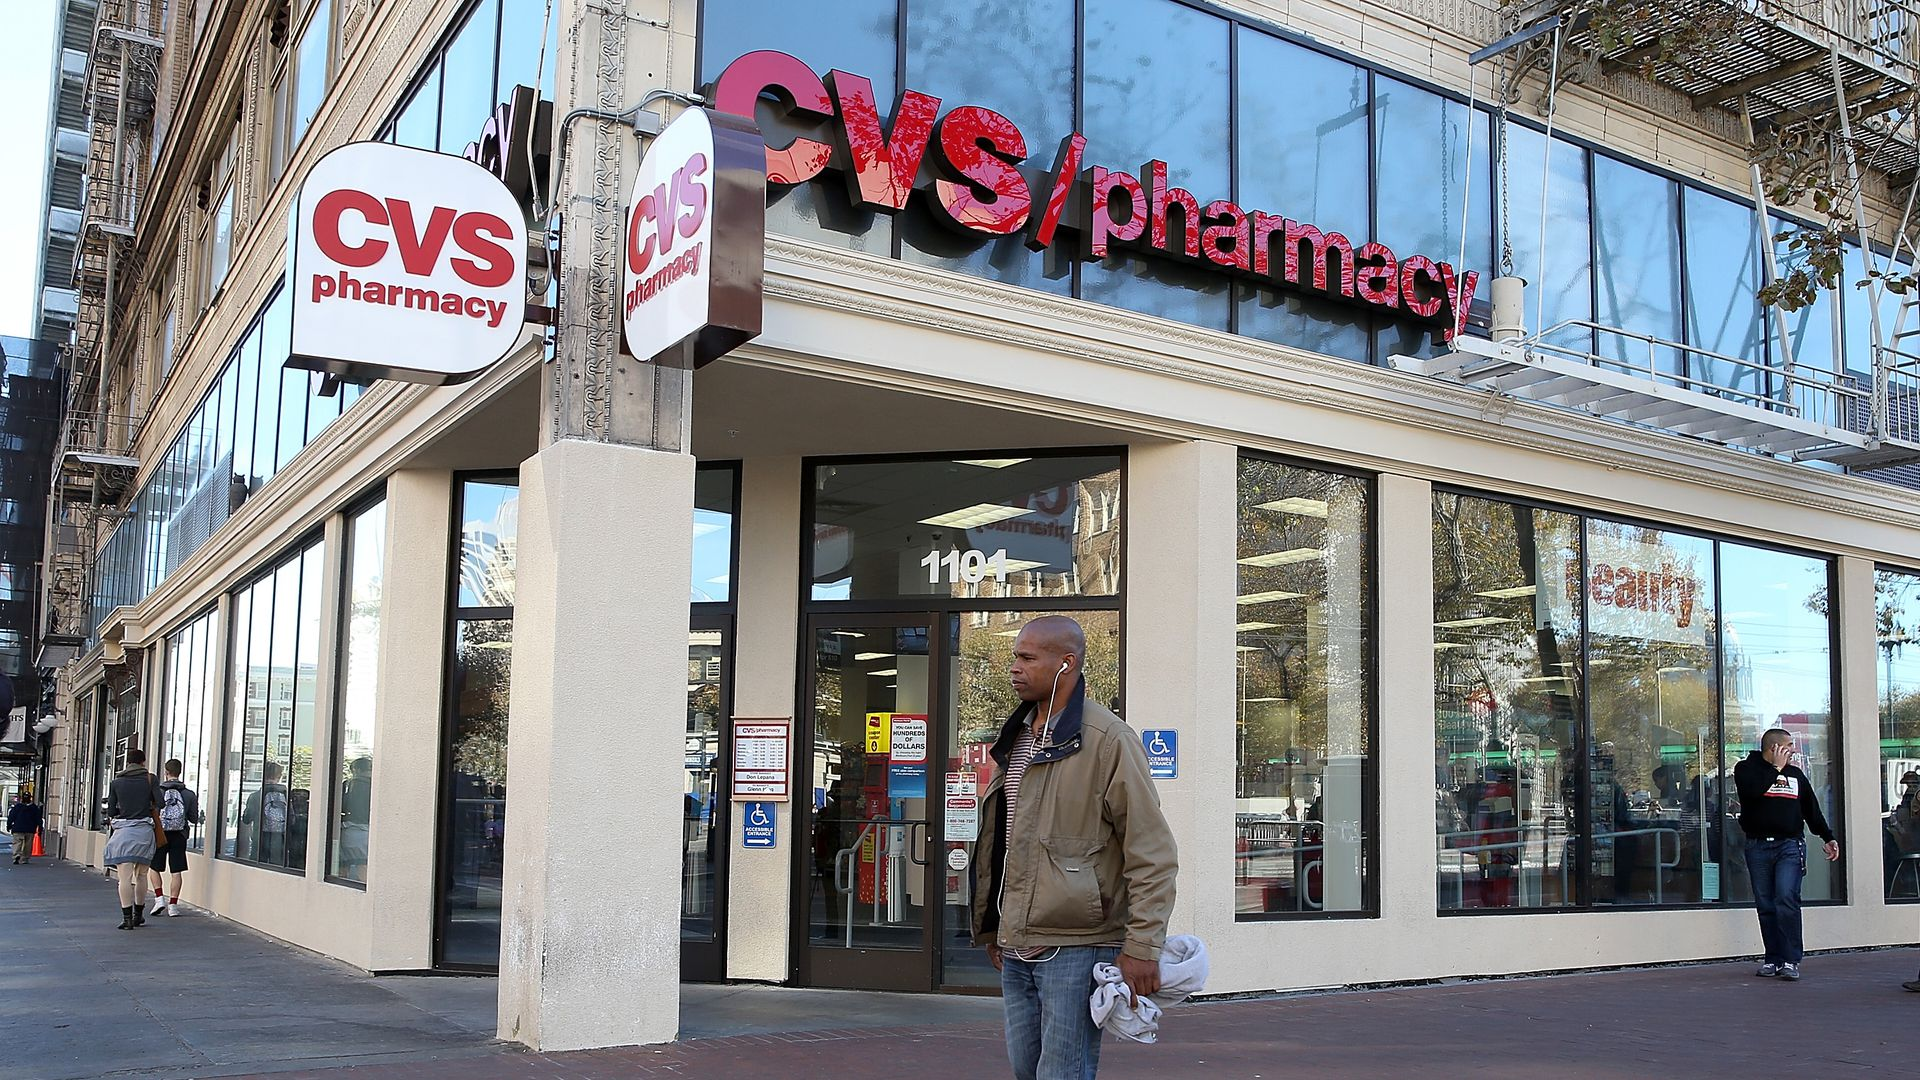 A man walks outside a CVS pharmacy building.